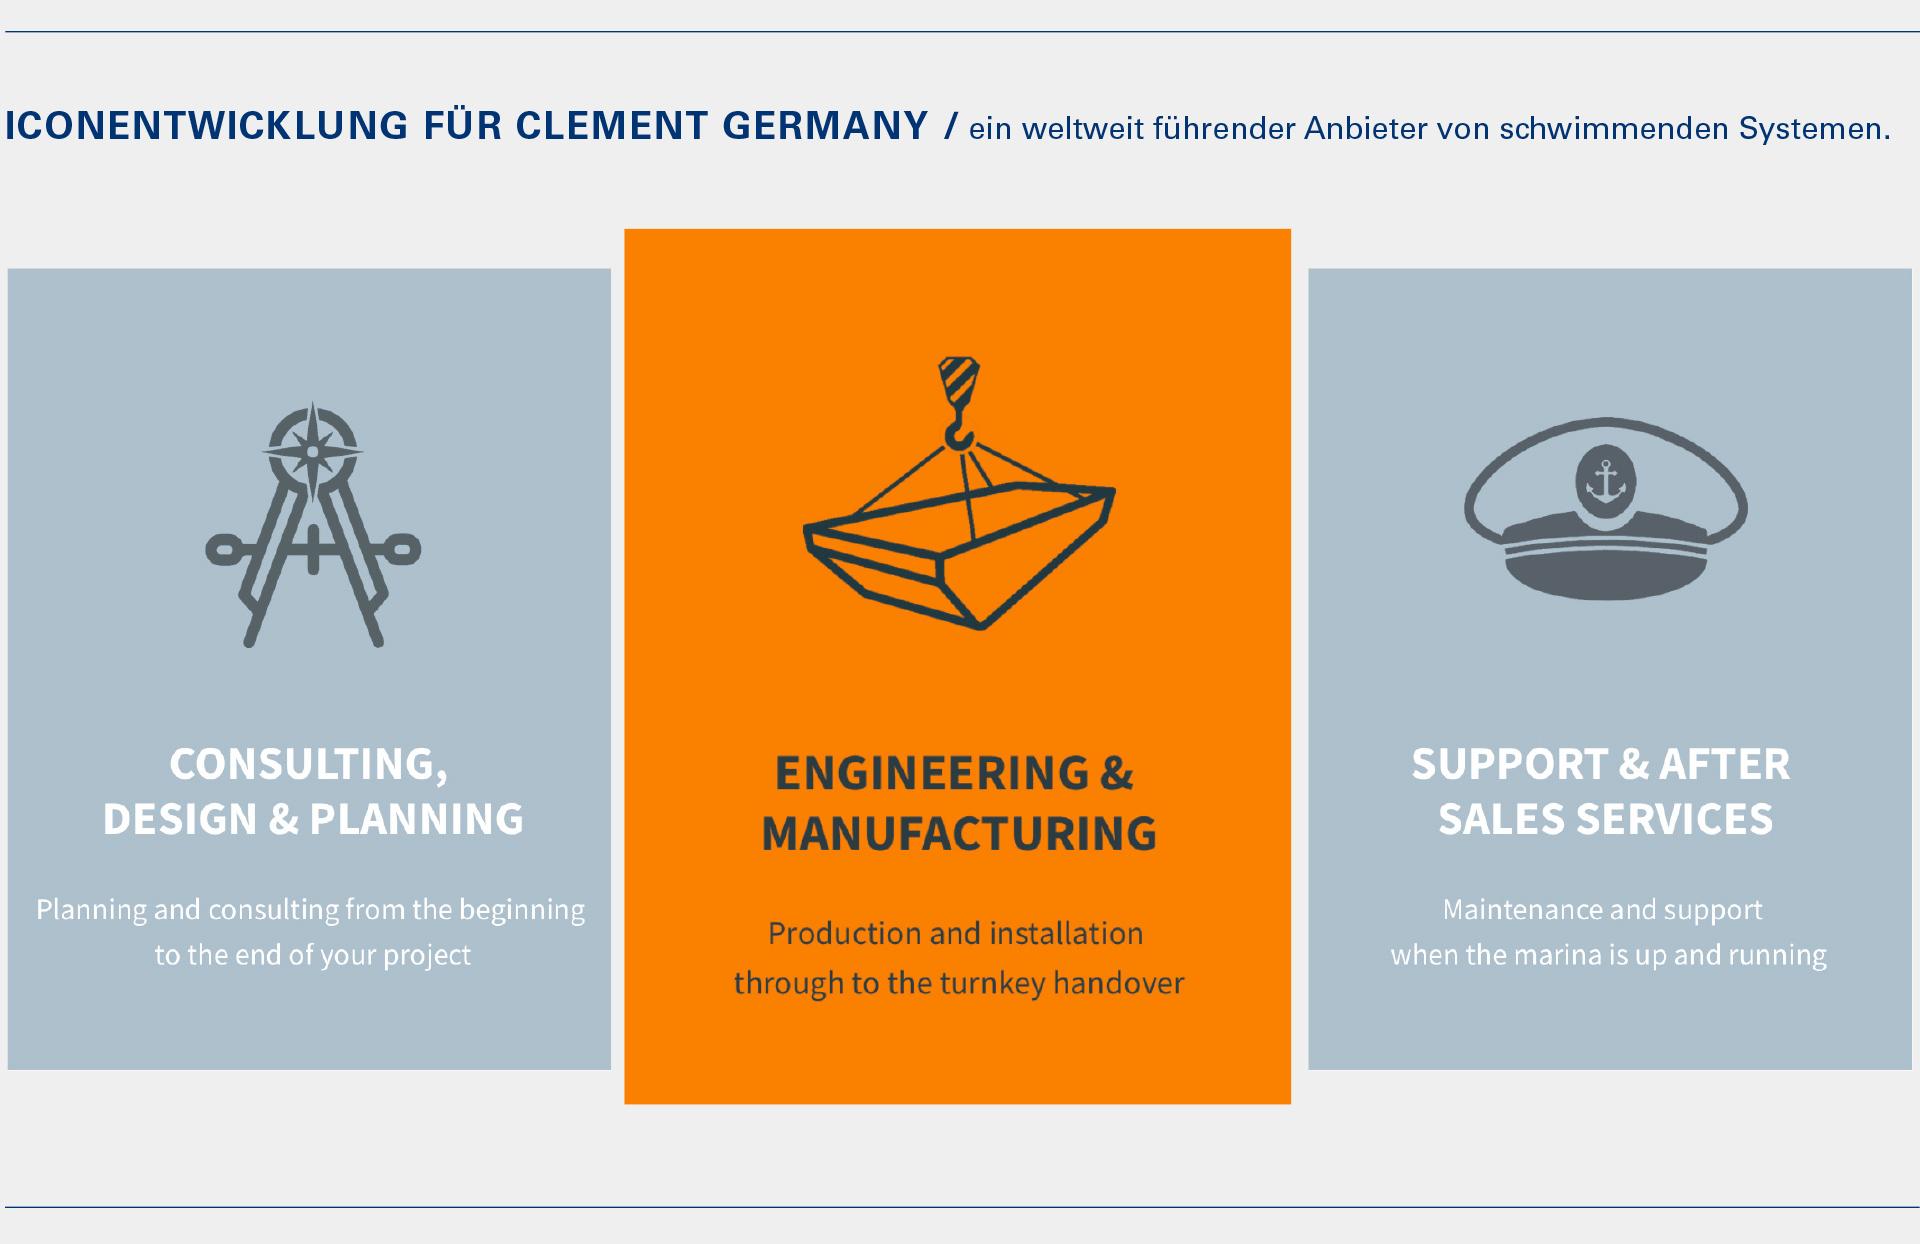 Referenz agreement - Infografik 4